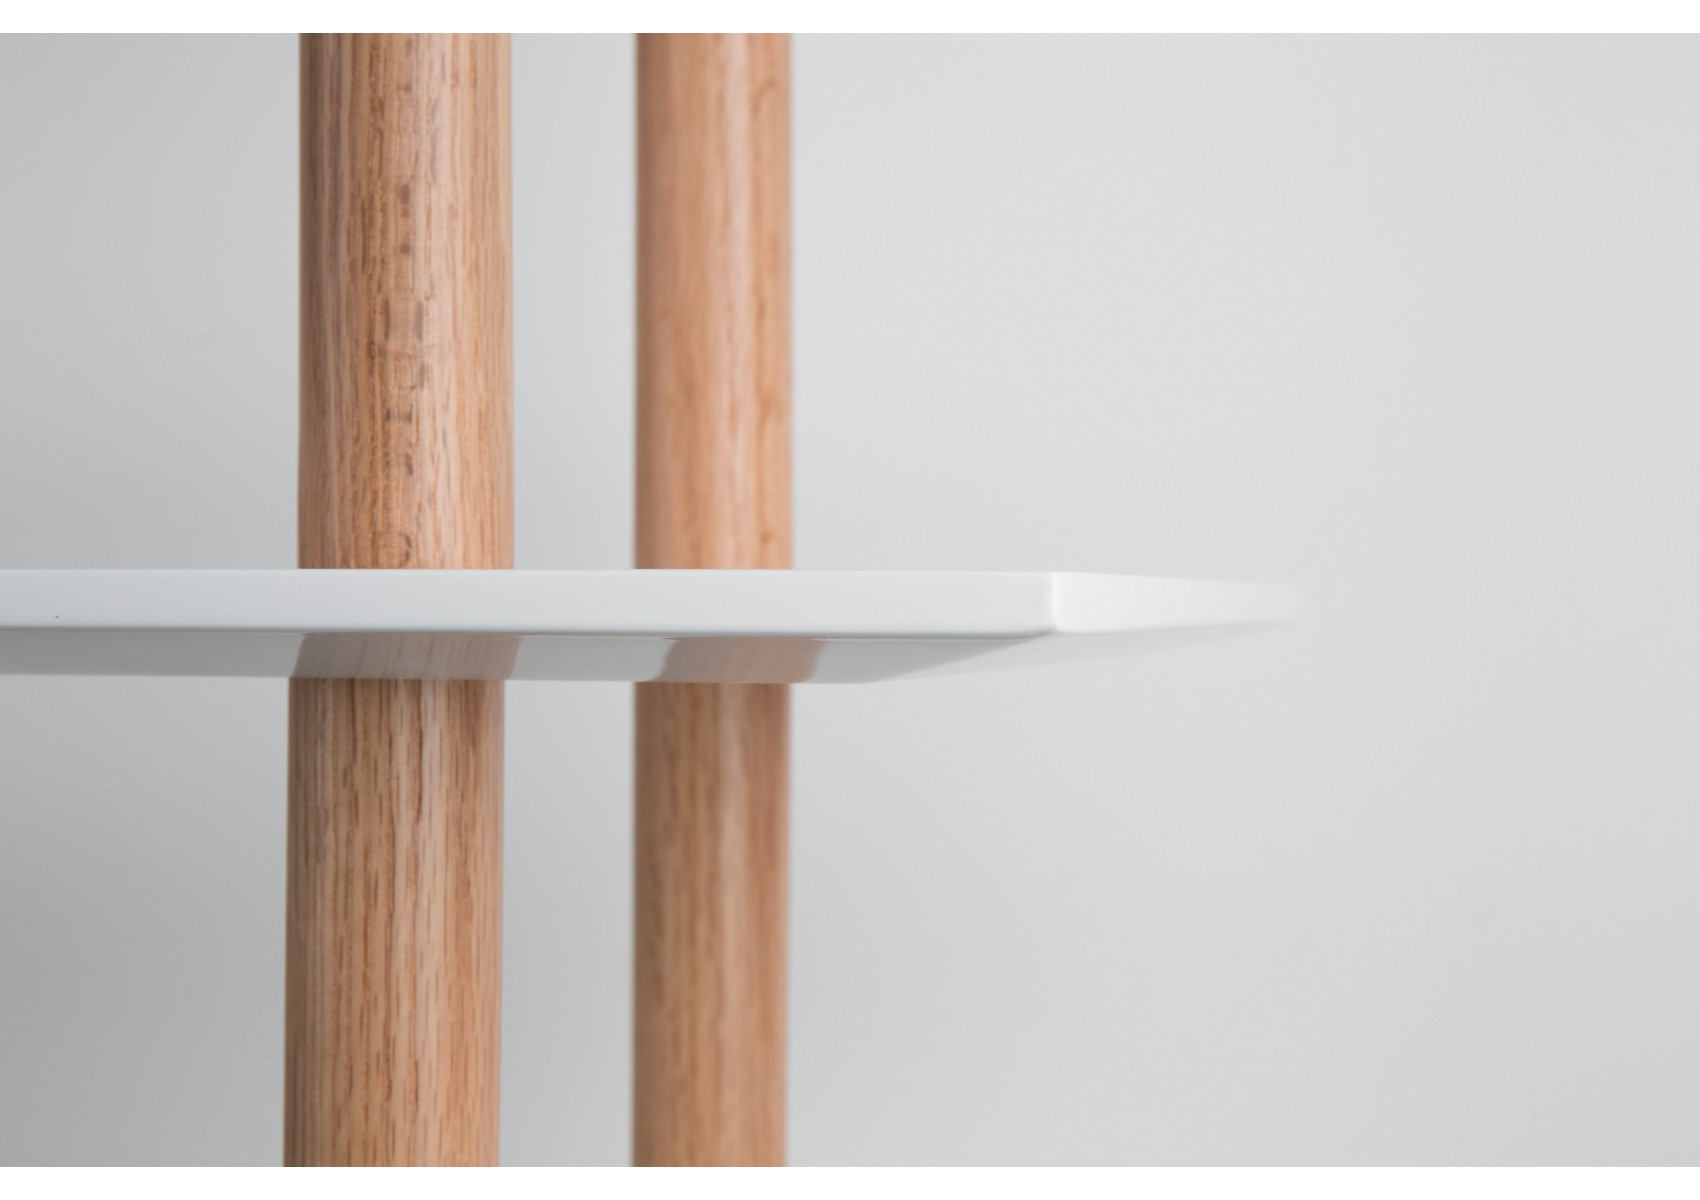 Étagères scandinave bibliothèque high on wood bookshelf - boite à design